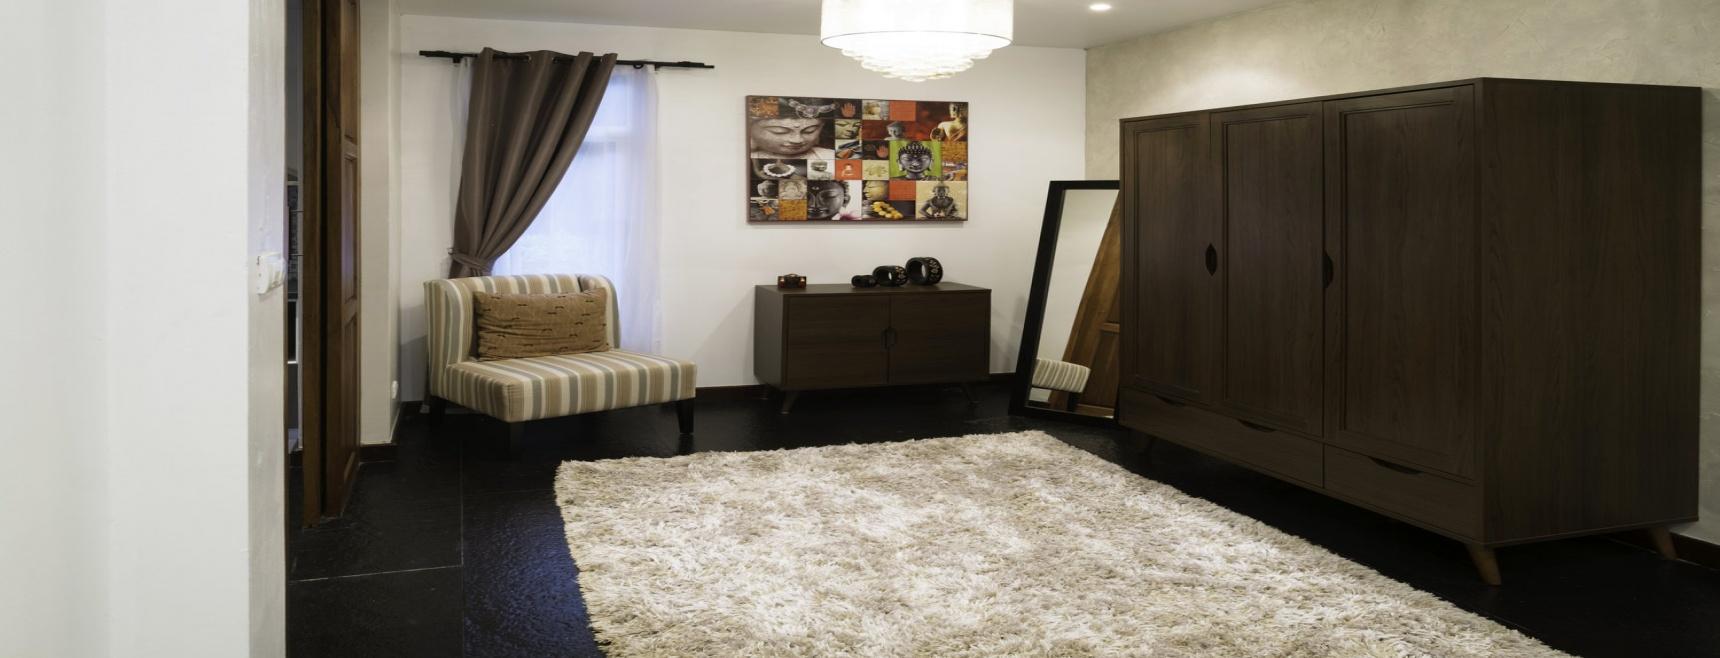 Villa Thai Sawan For Sale Patong Phuket (Thai-Real.com)